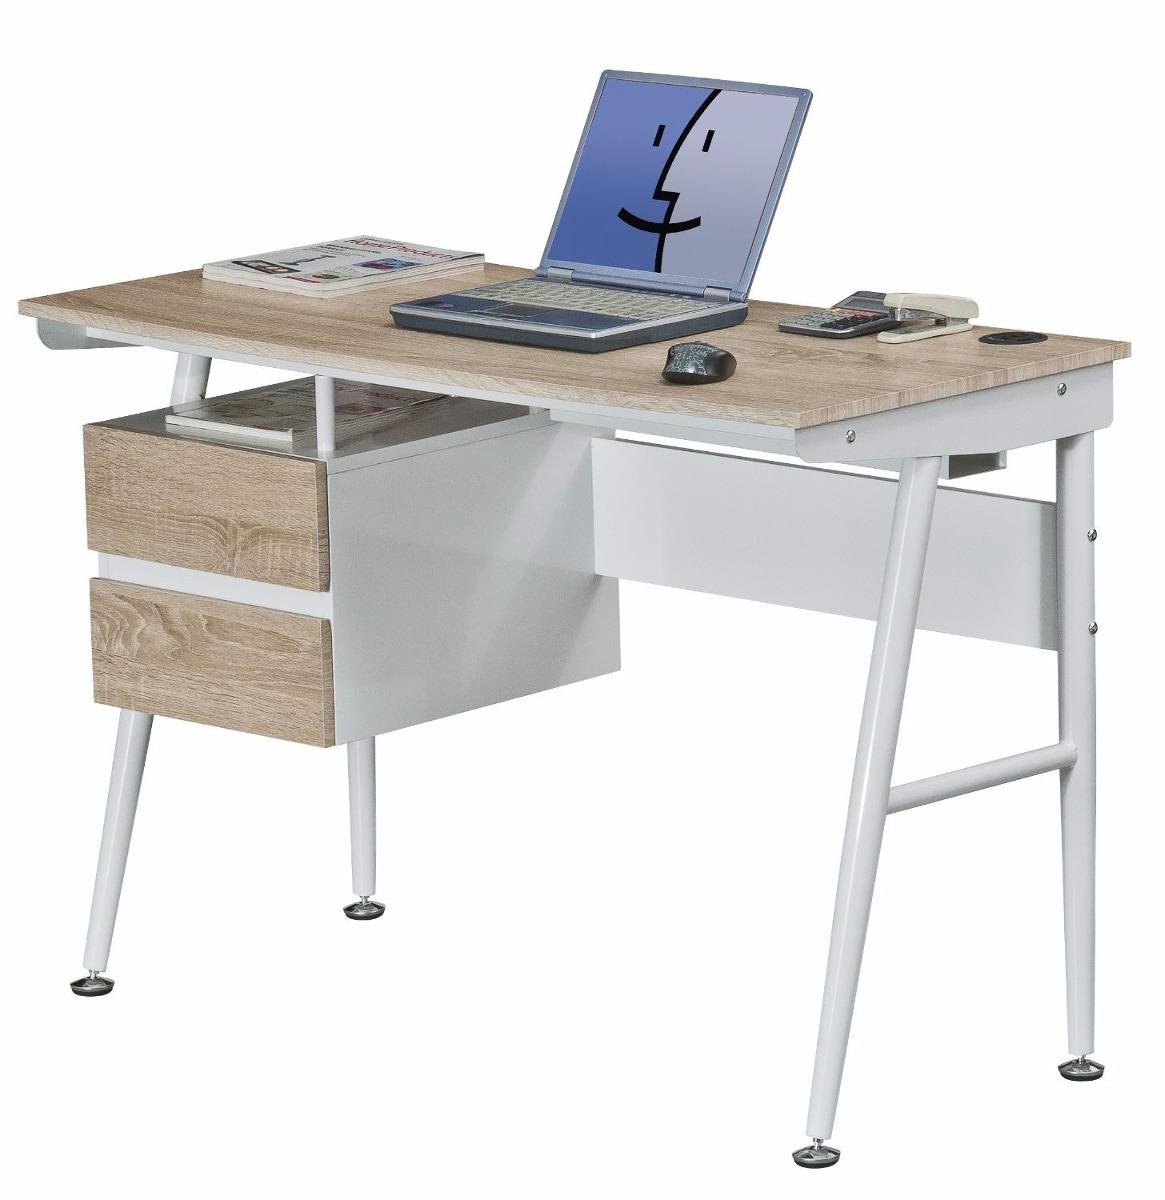 Escritorio clasico oficina computadora mueble madera acero for Escritorio mueble oficina